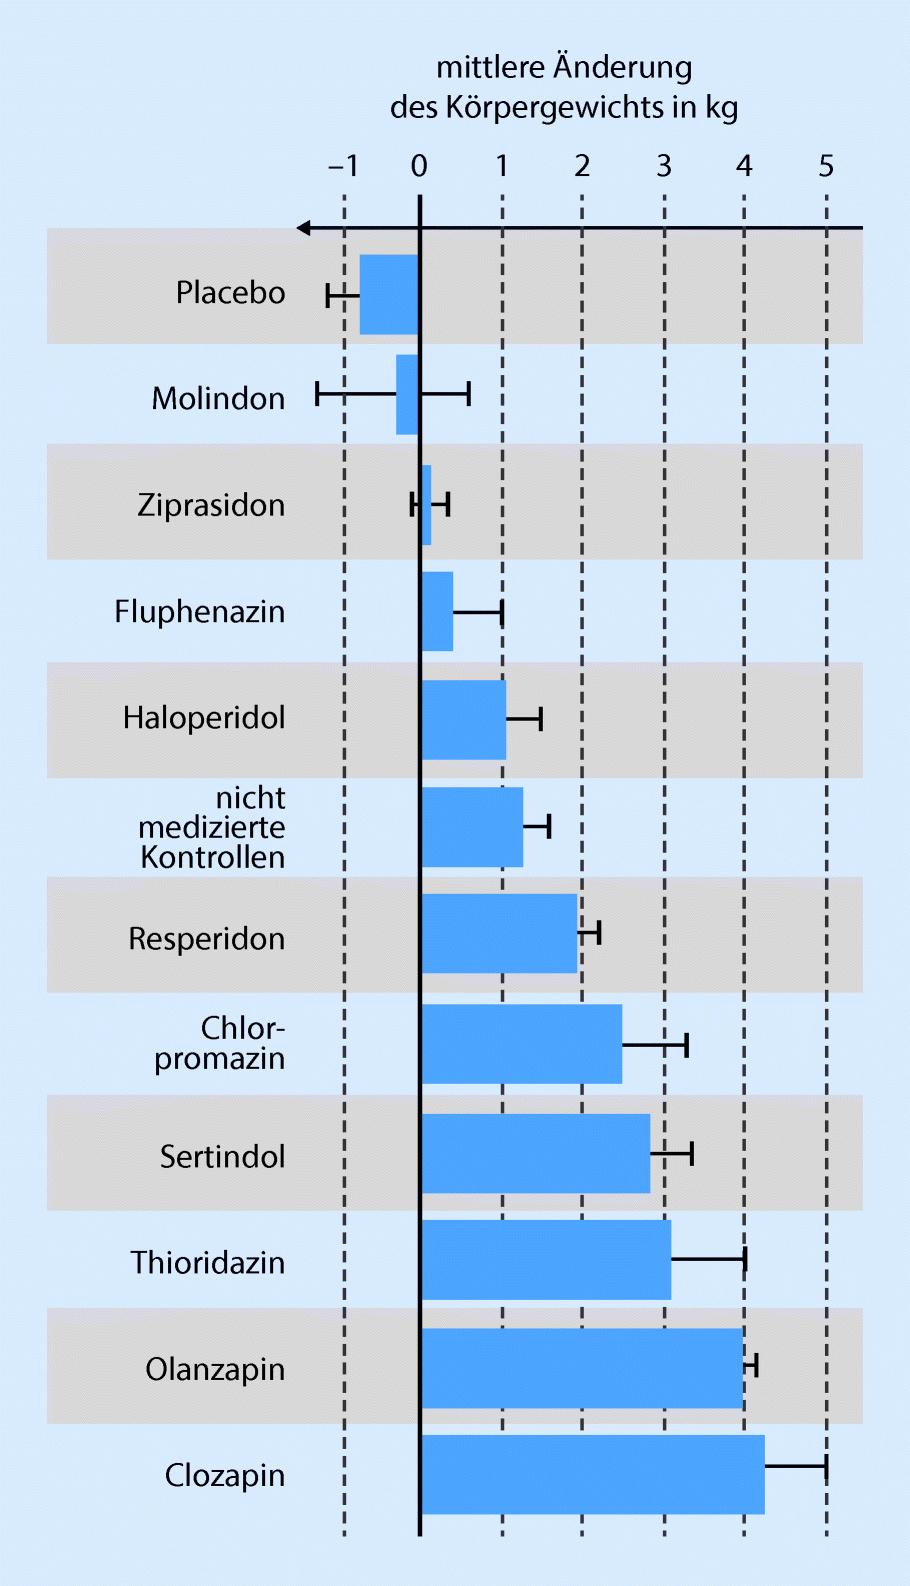 amineurin 10 mg gewichtszunahme